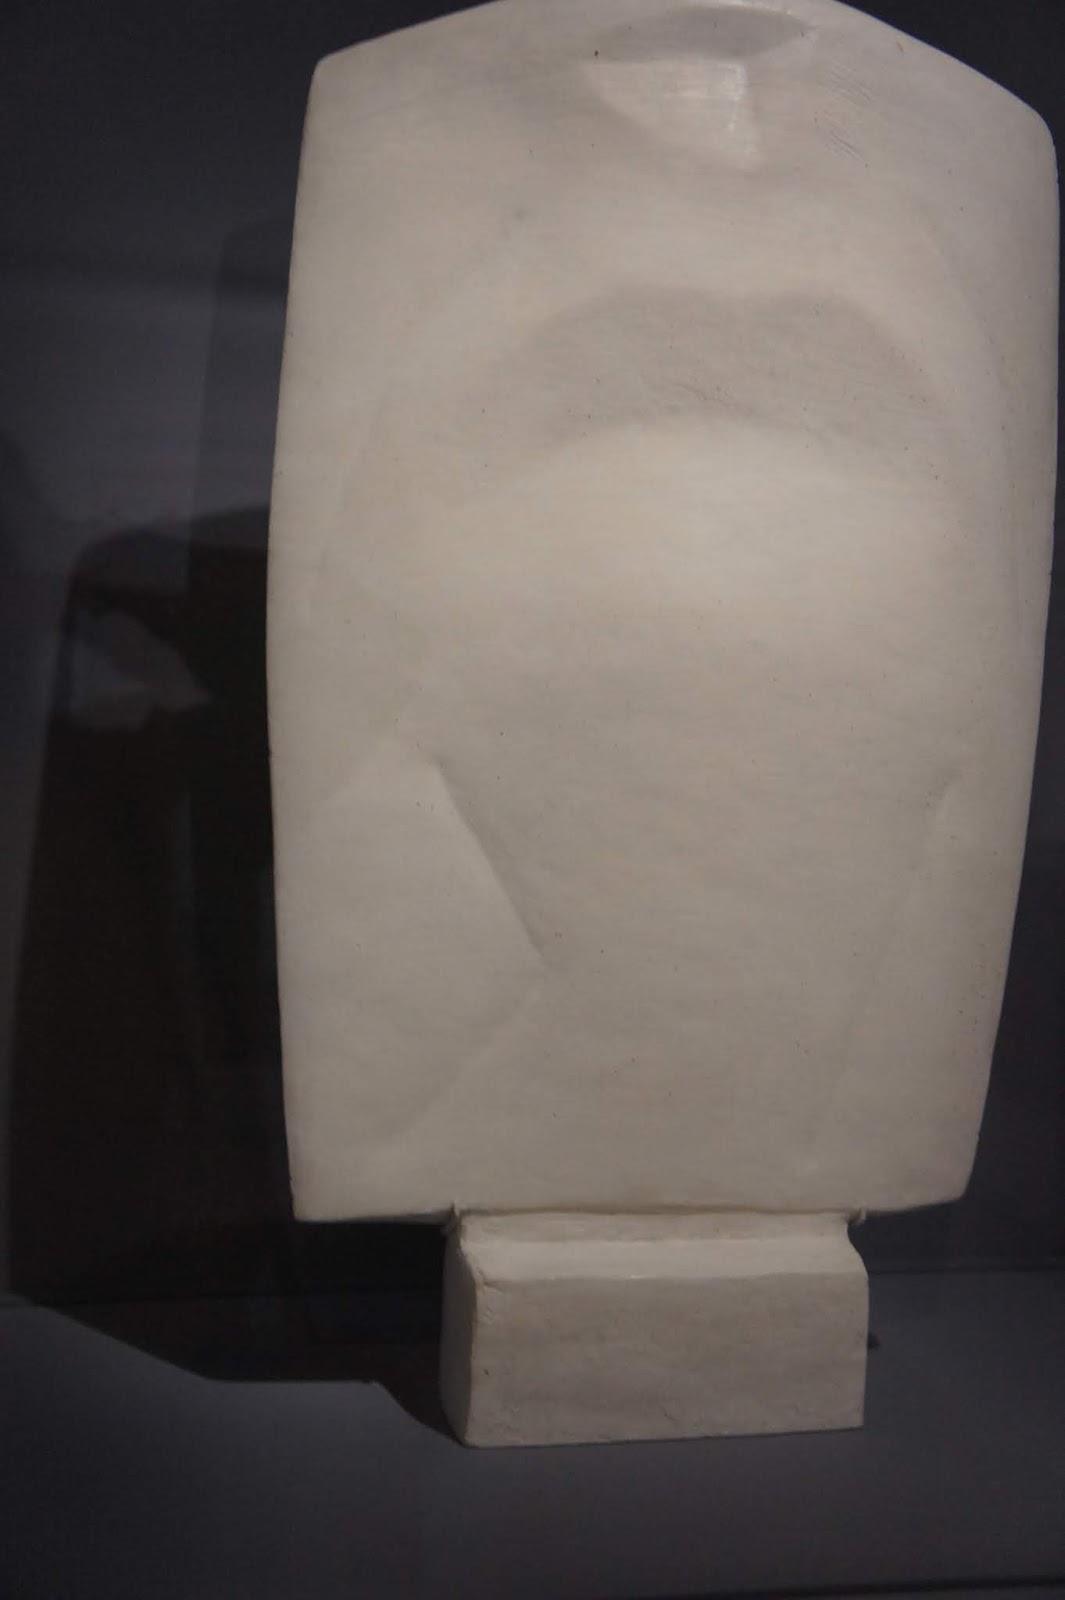 4489572c19f8e4 Femme plate V vers 1929 ,plâtre, fondation Giacometti Paris et Tête crâne  1934, plâtre, fondation Giacometti paris. Les stèles et les figures plates,  ...